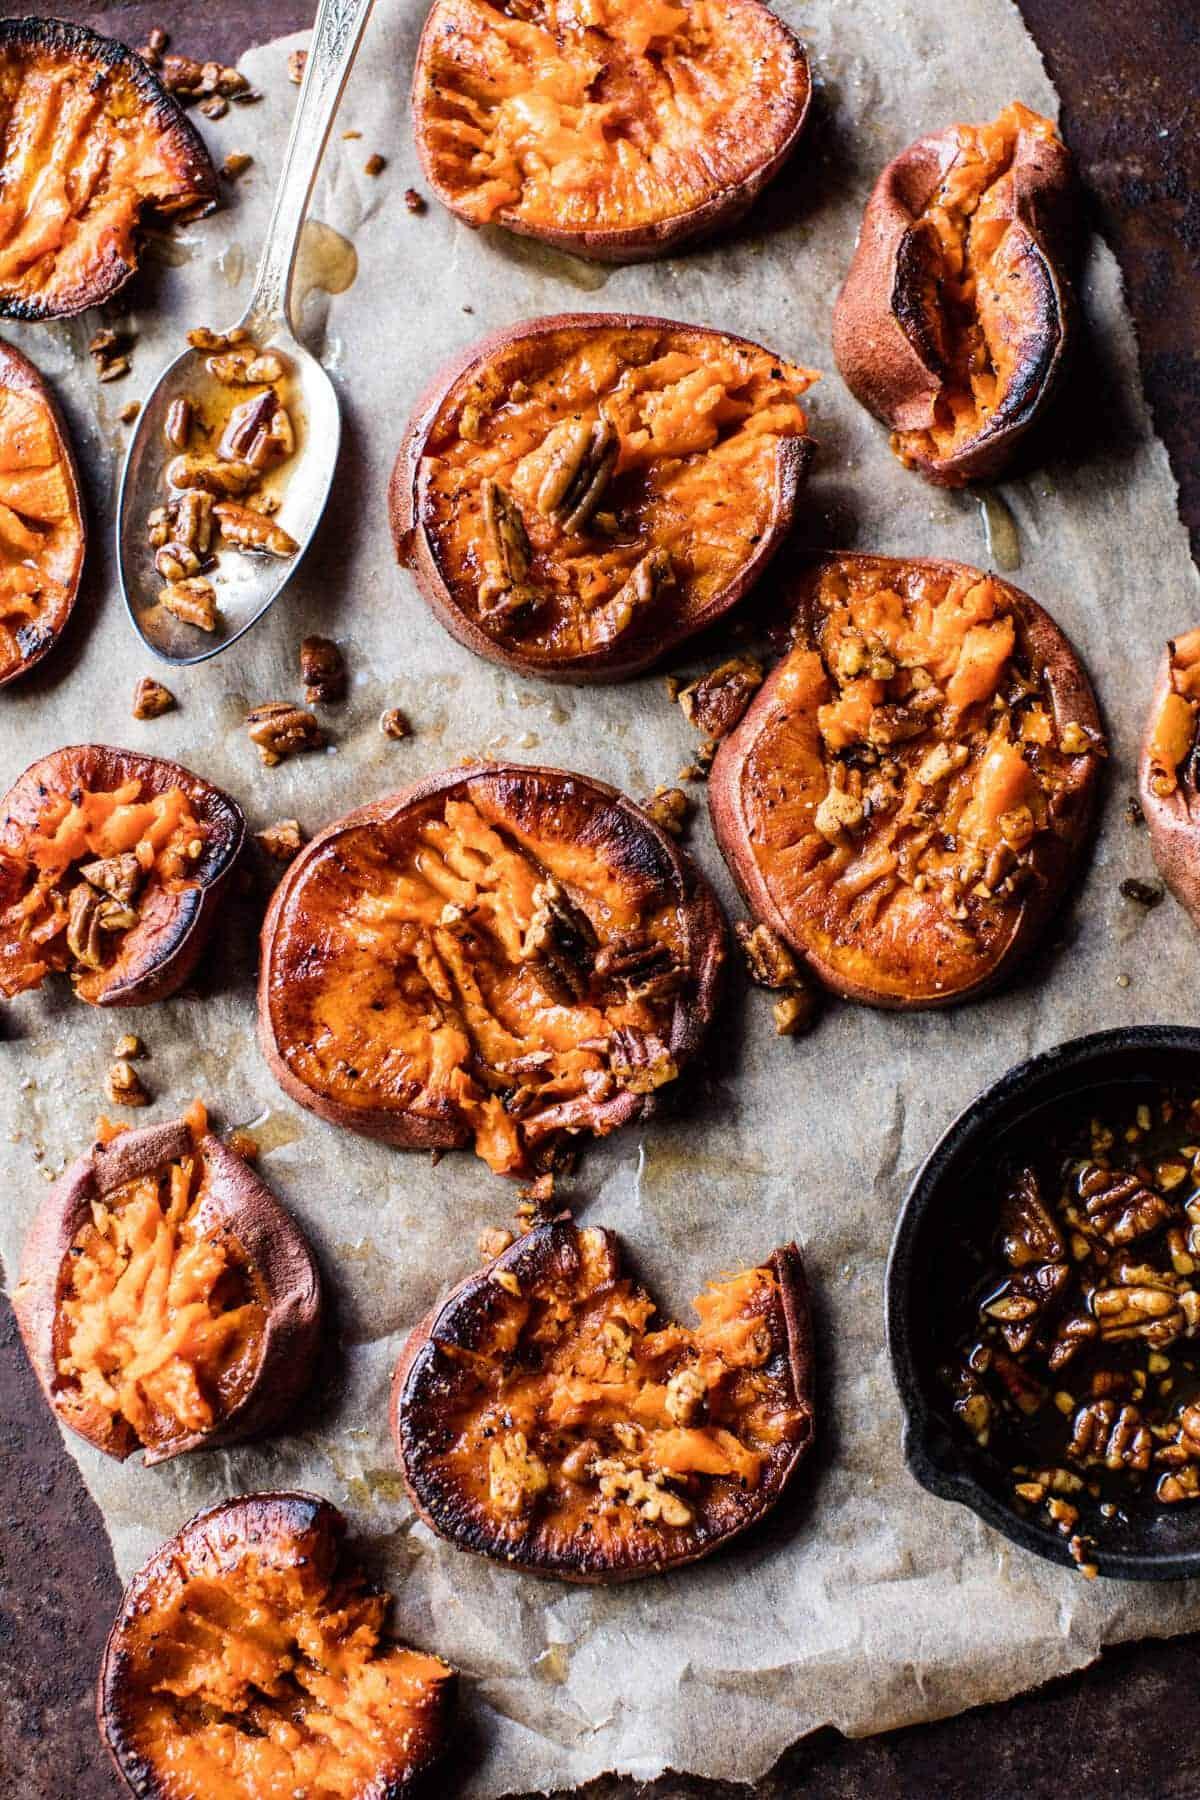 Crispy Roasted Sweet Potatoes with Bourbon Maple Butter. - Unionbeatz ...